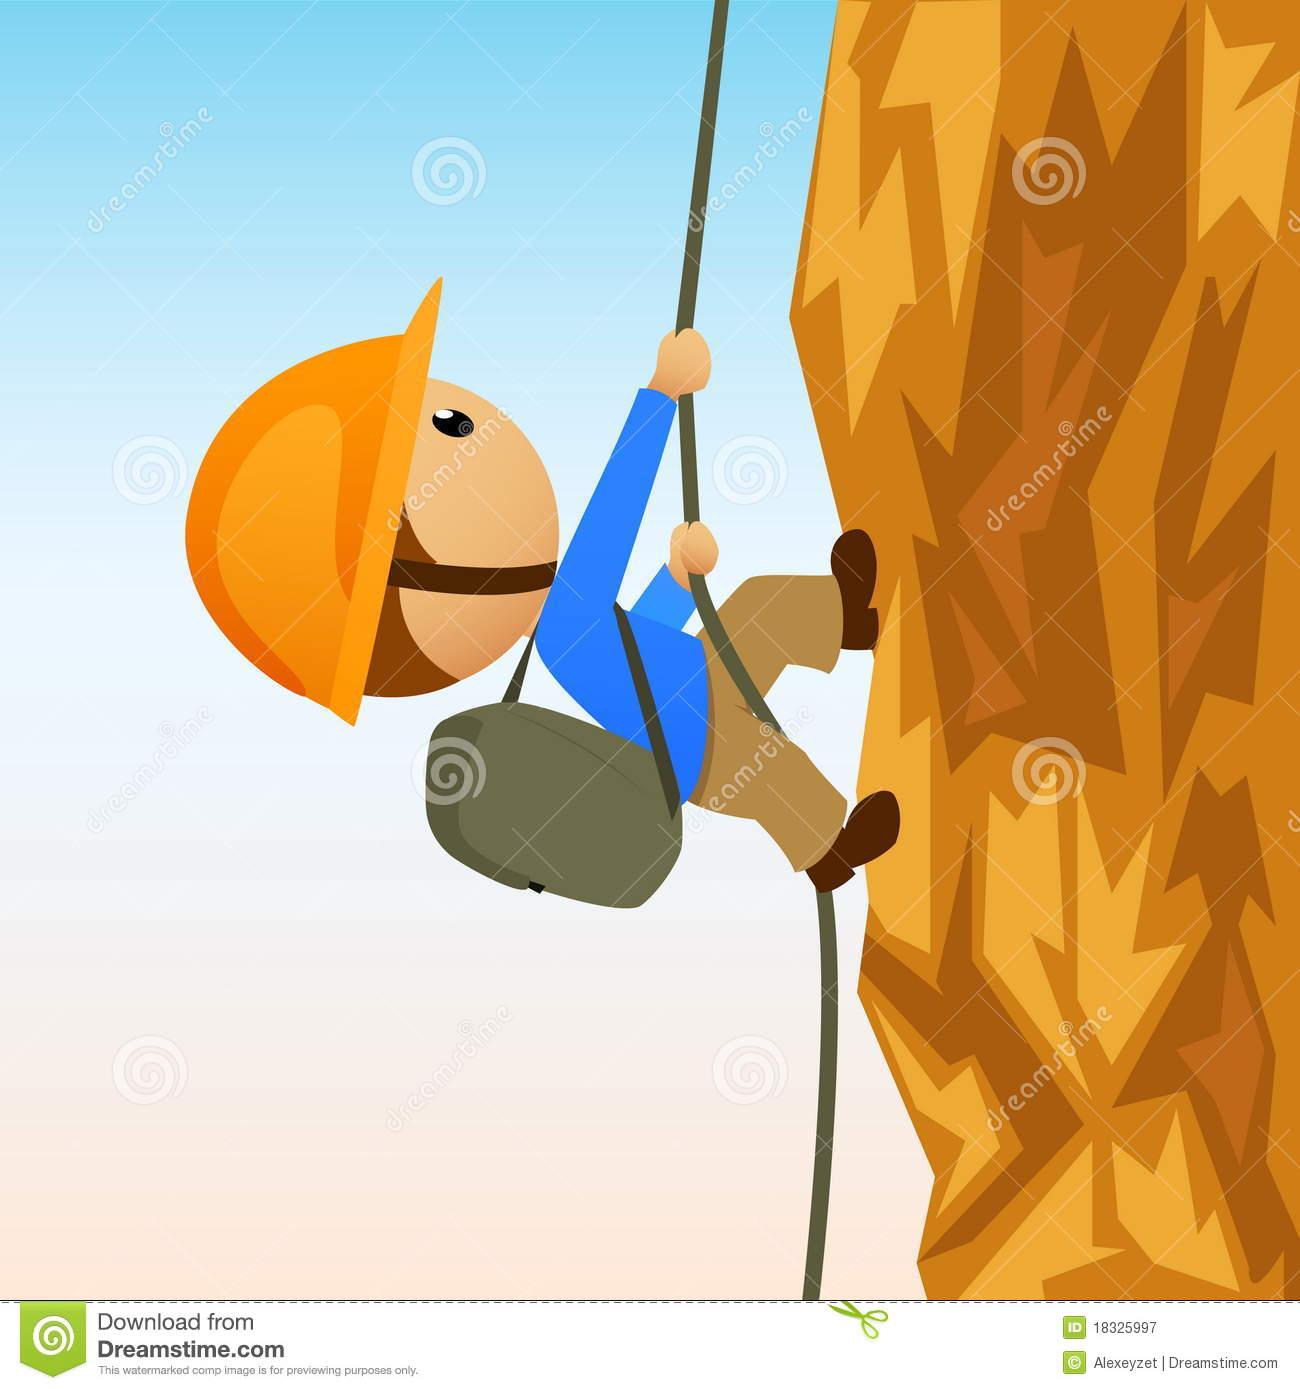 Vertical wall climbing clipart - Clipground